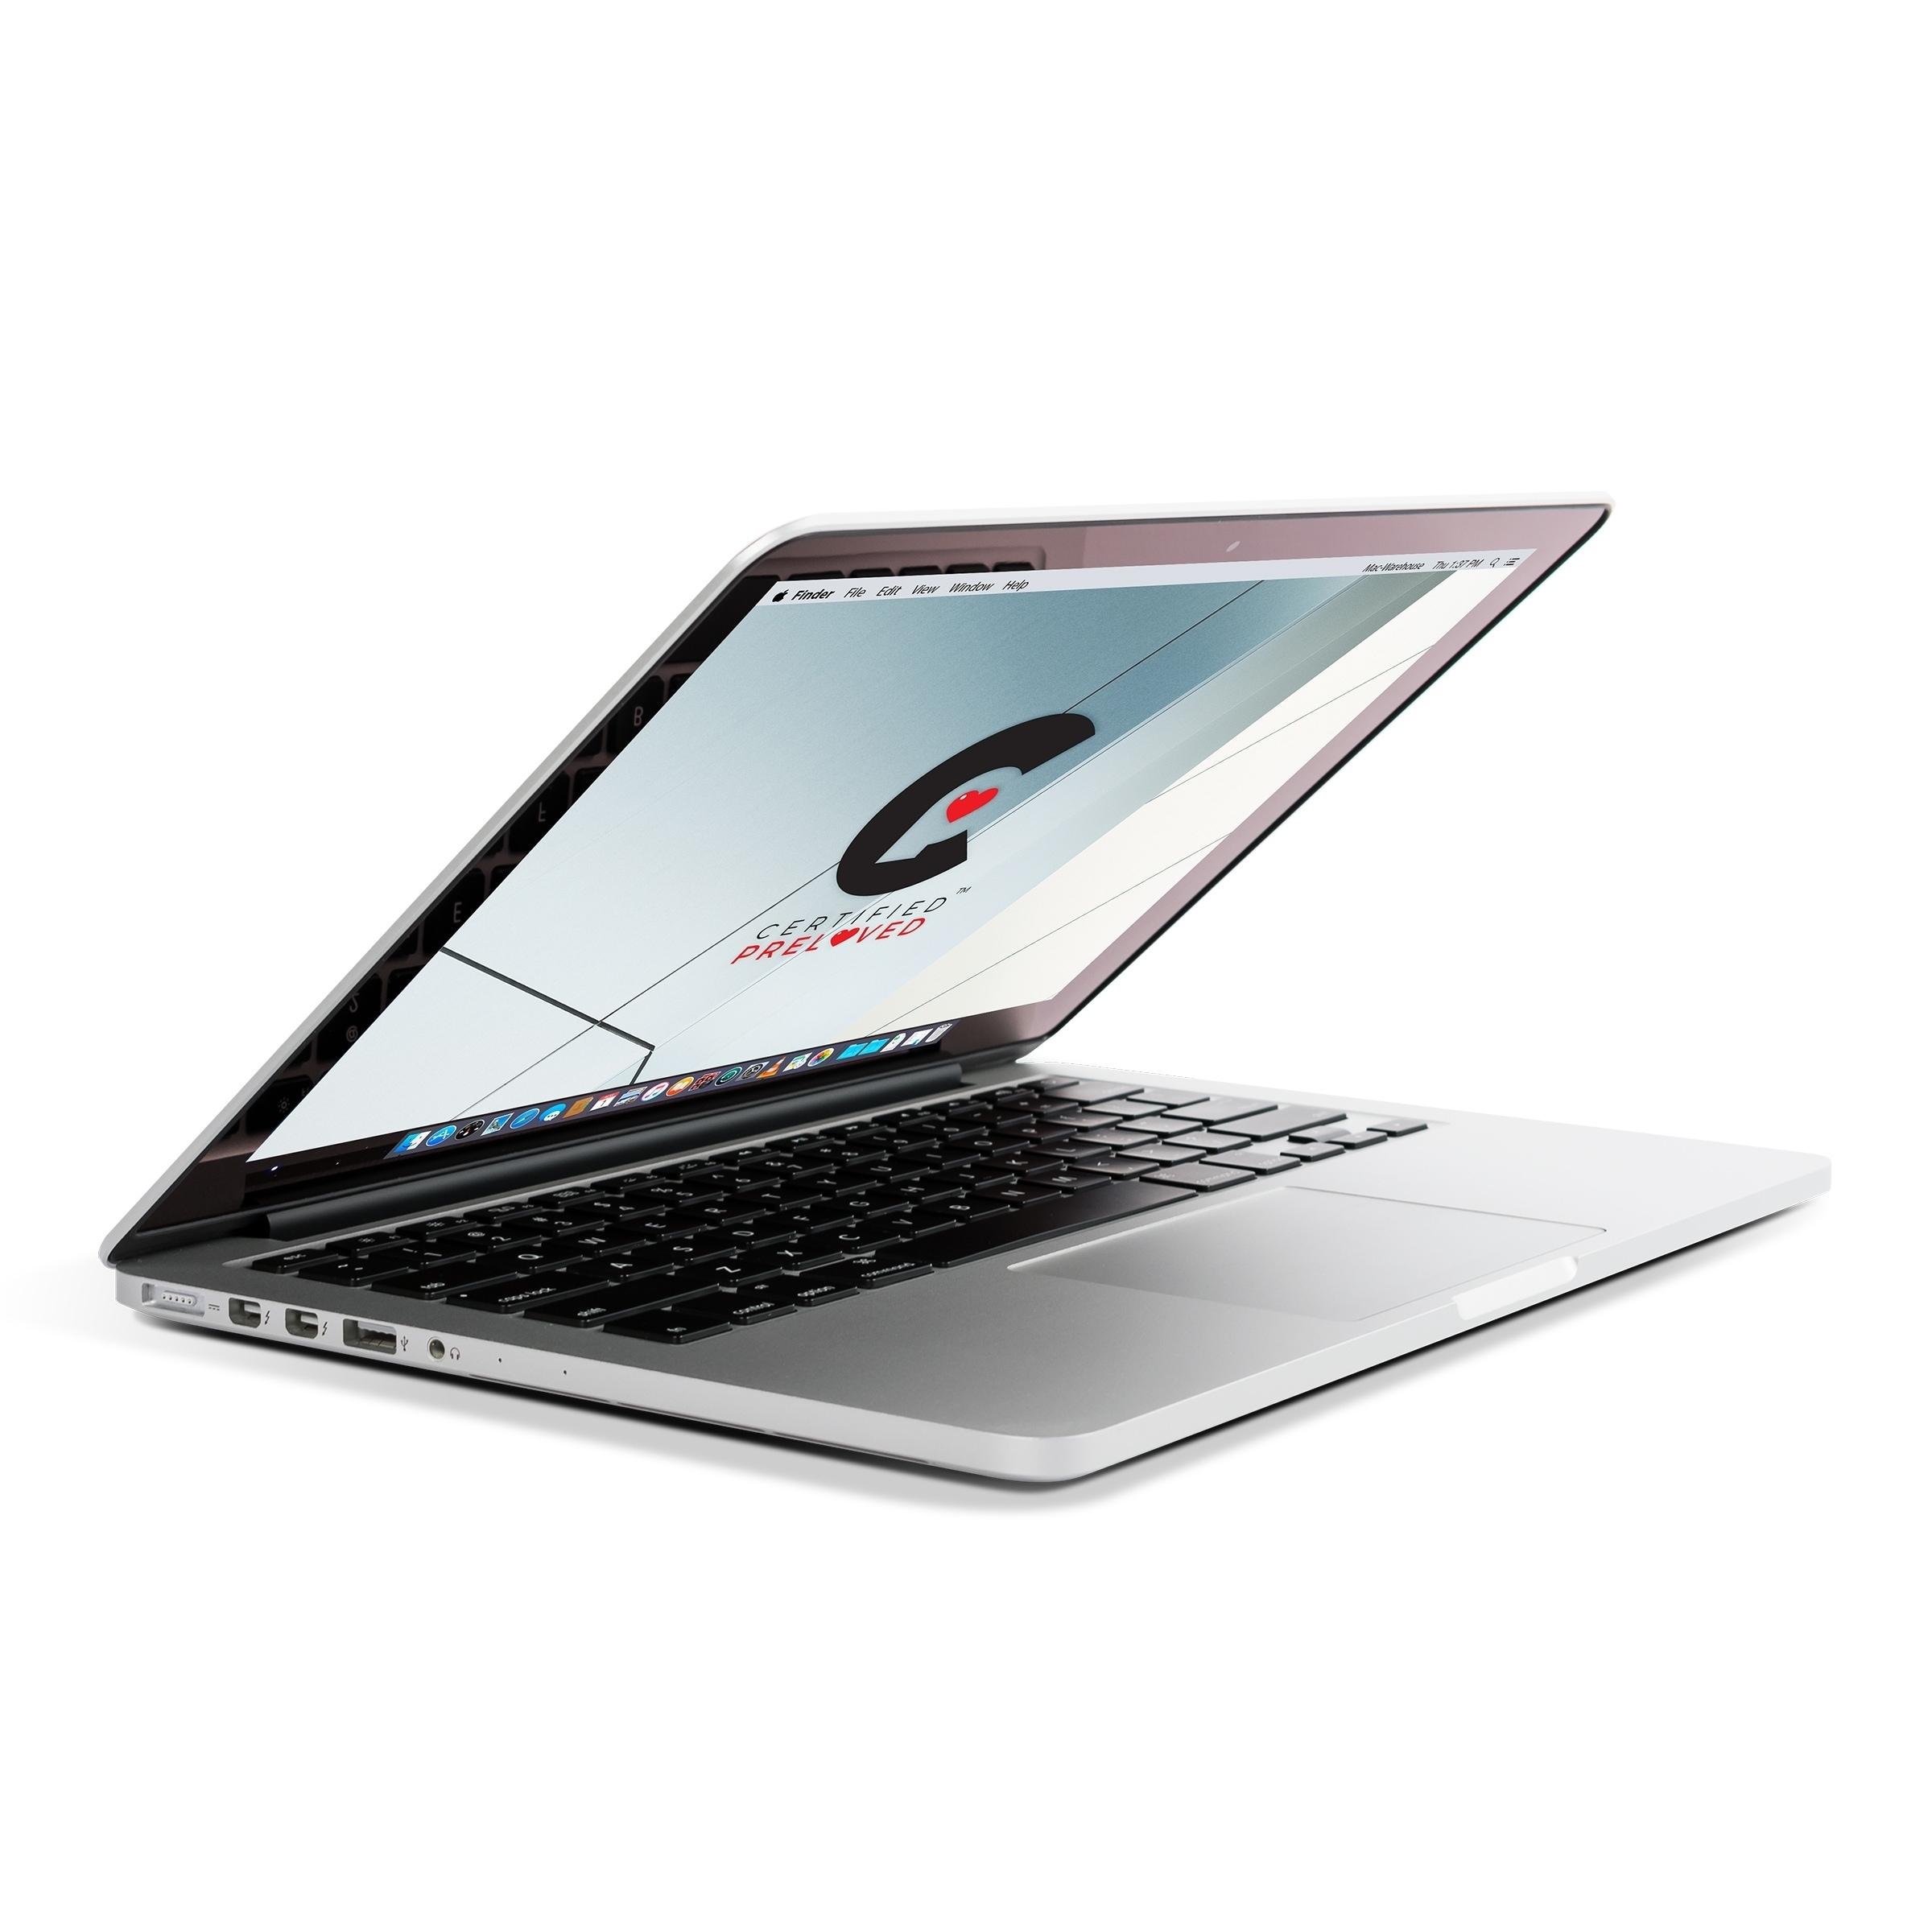 Apple 13.3-inch Macbook Pro MLL42LL/A DCi5 2 GHz 8GB RAM 256GB SSD - Refurbished by Overstock - 256gb flash 256gb flash - 8 GB